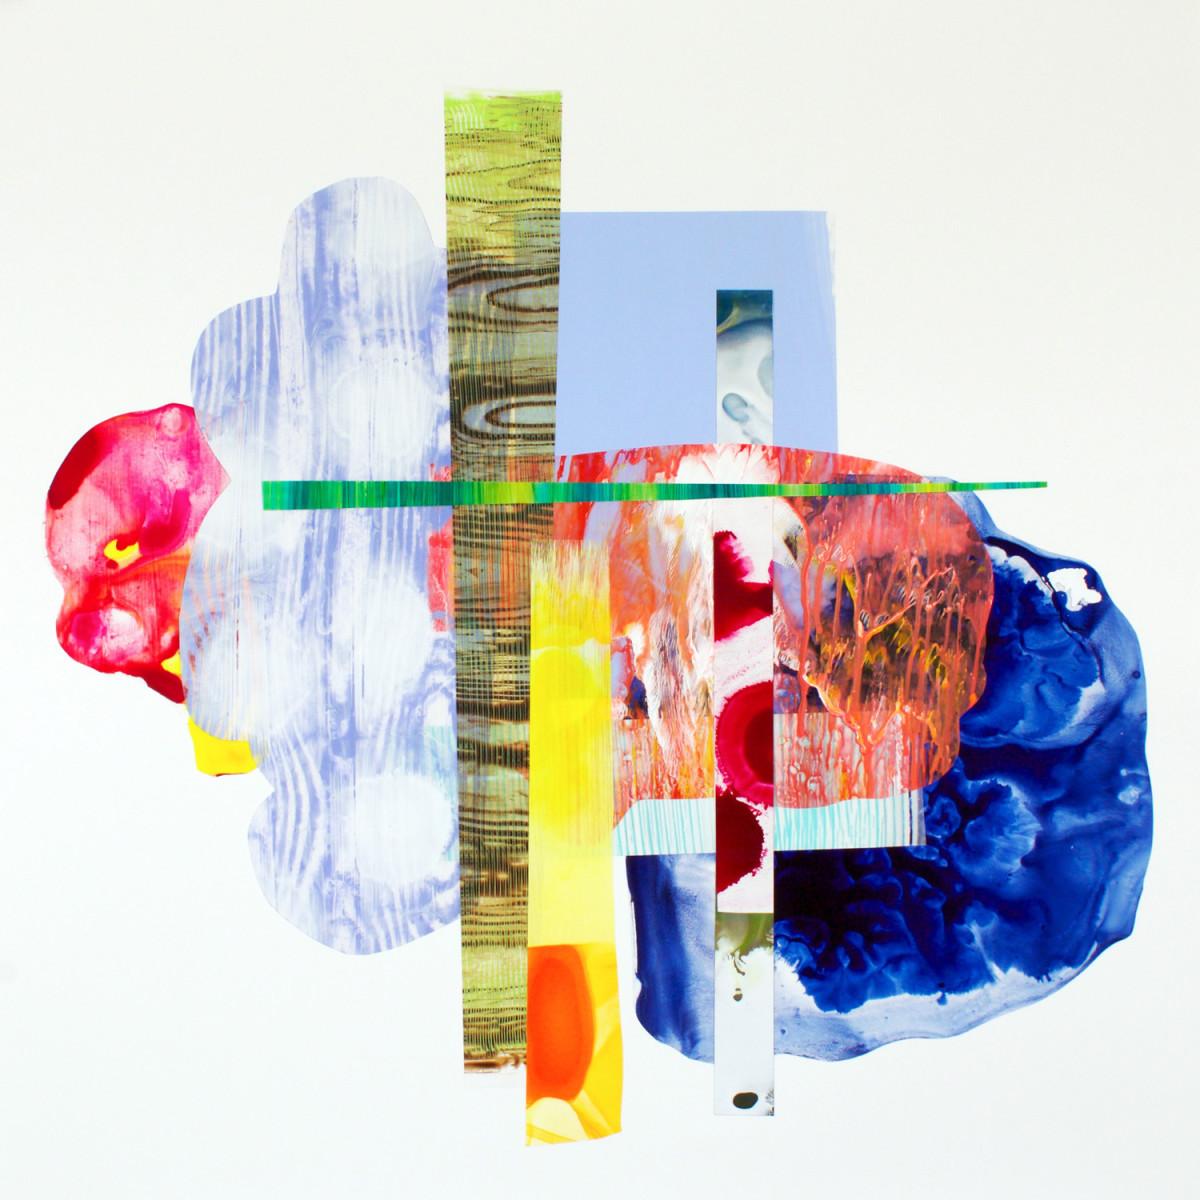 Funk O' Rama by Mary Zeran